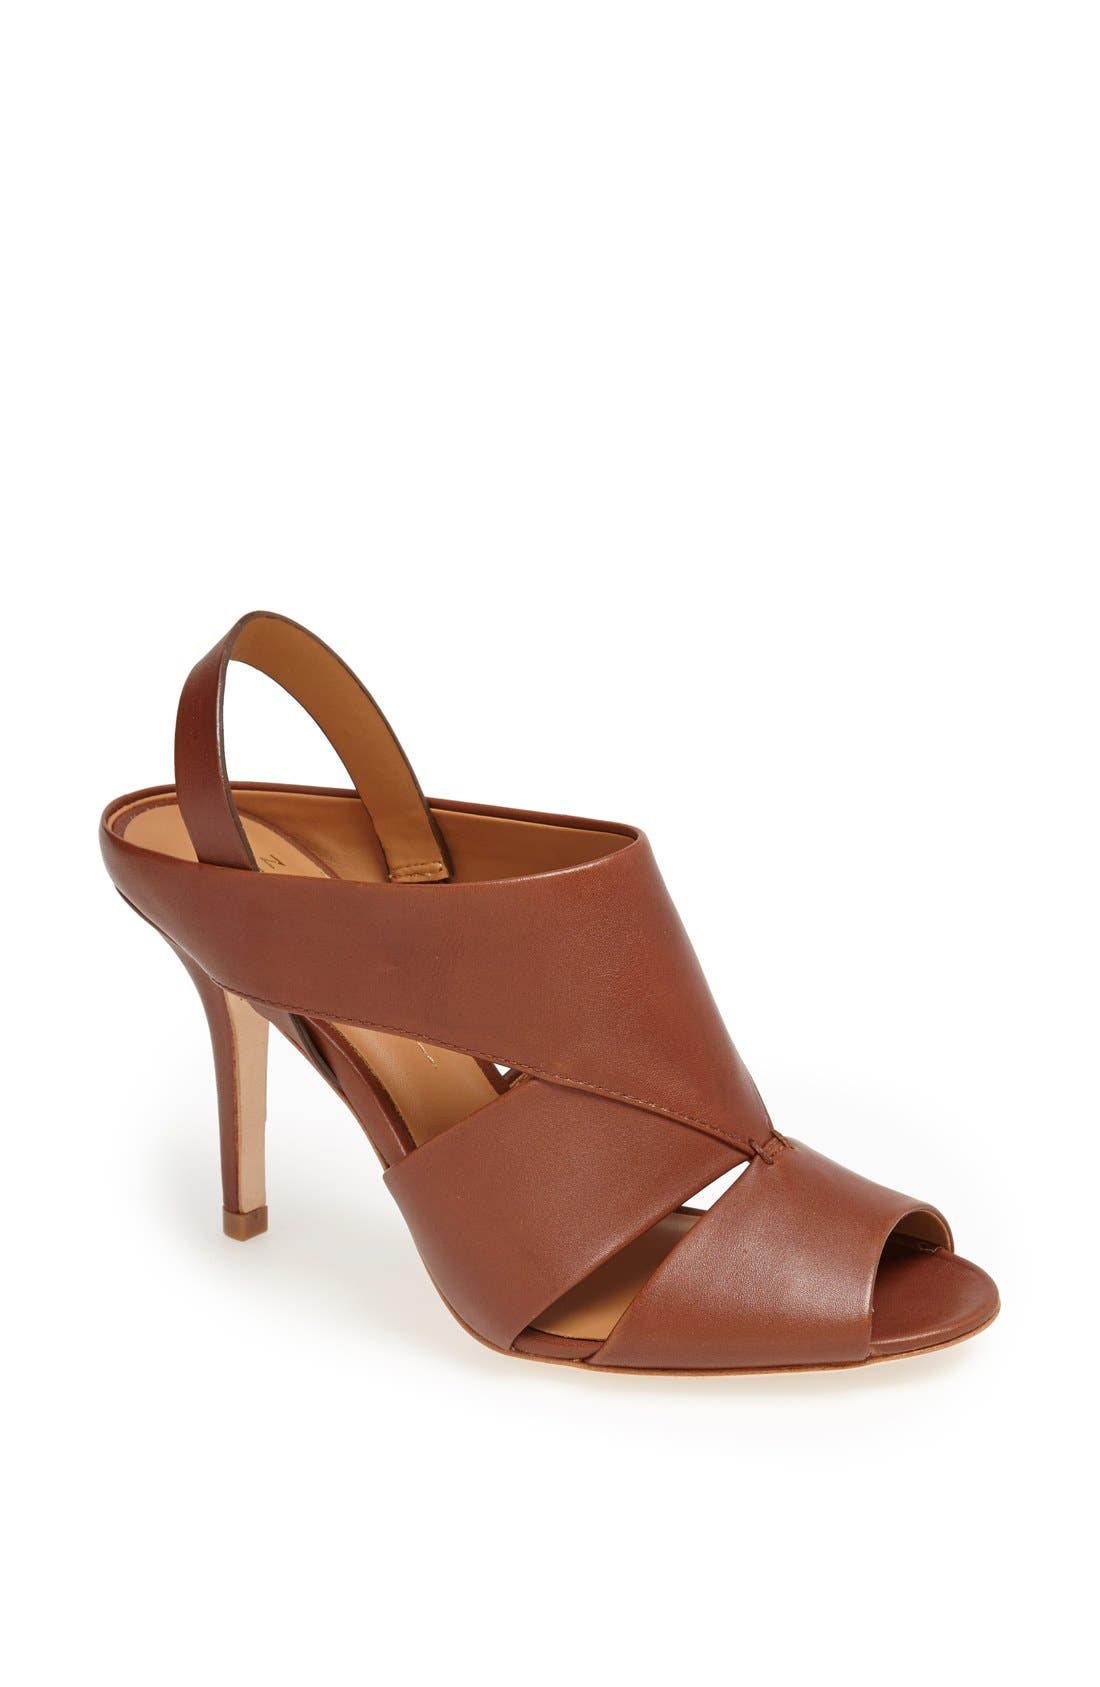 Alternate Image 1 Selected - Aerin 'Cambel' Slingback Shield Sandal